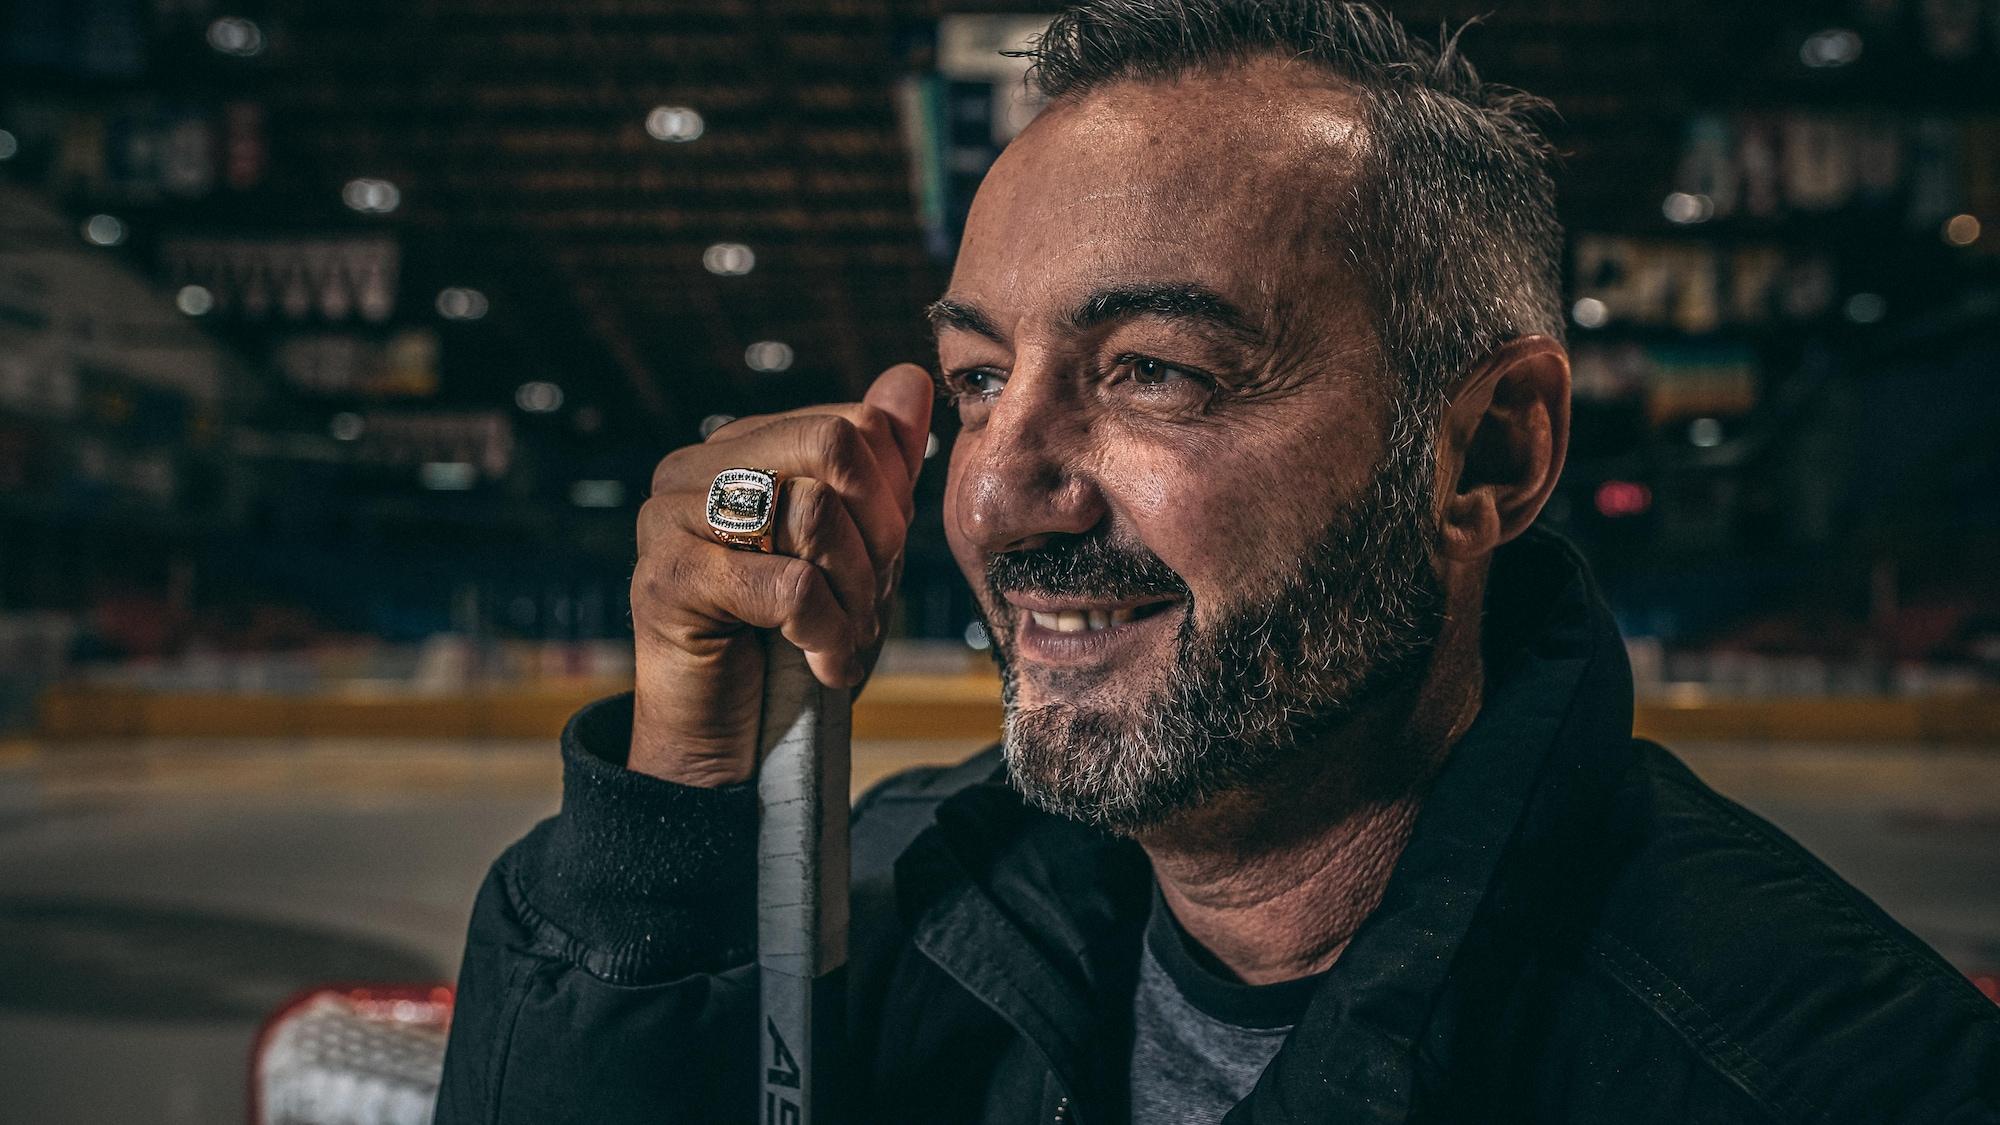 L'ex-hockeyeur sourit.